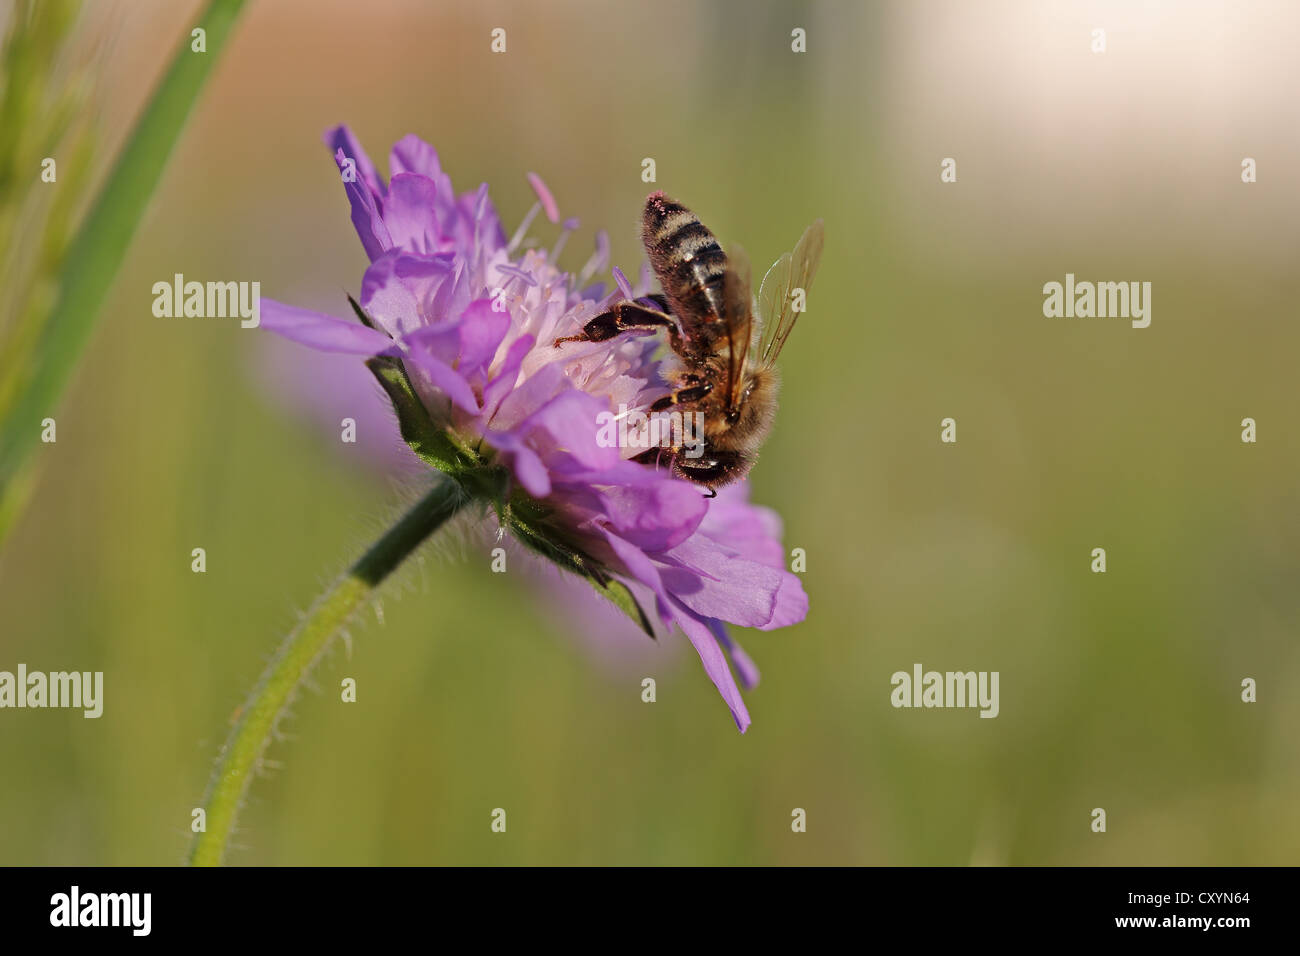 Honey bee (Apis mellifera) on a Scabious flower (Knautia), Baden-Wuerttemberg - Stock Image